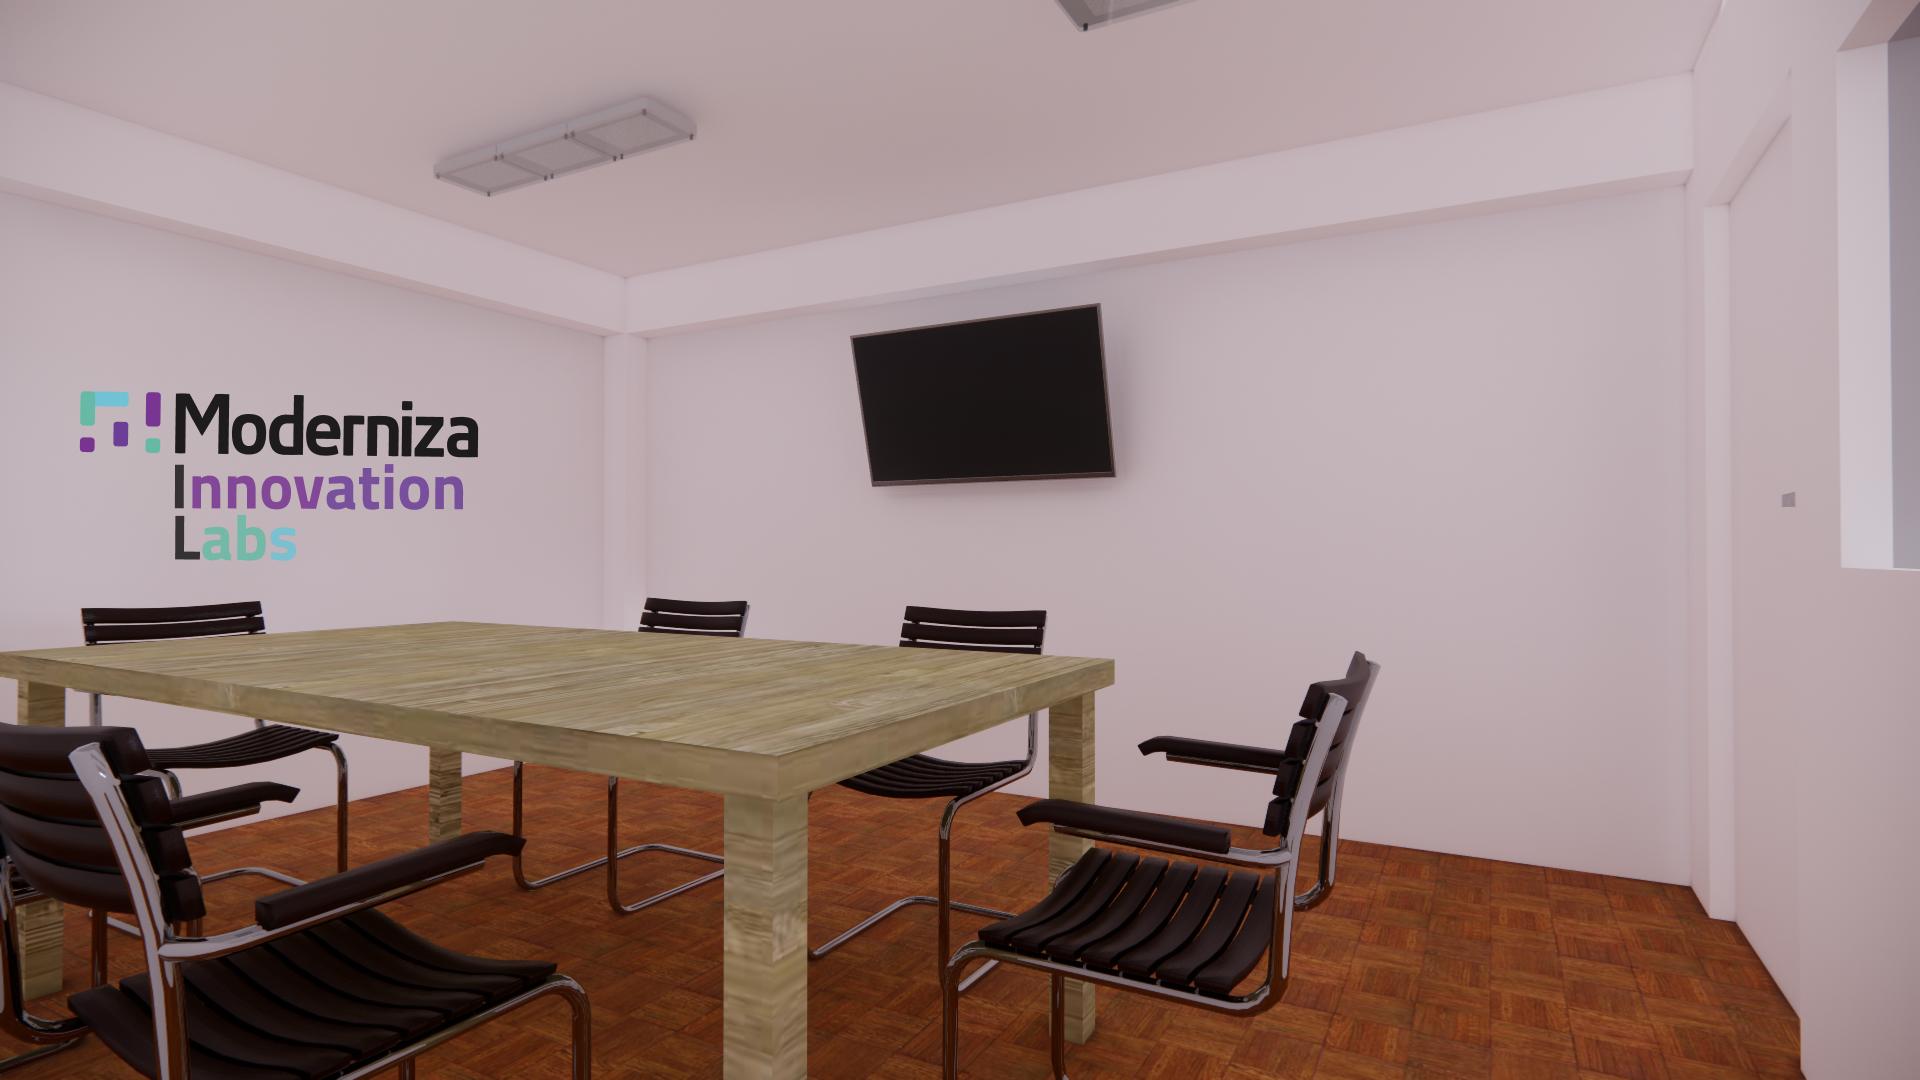 Moderniza Innovation Labs